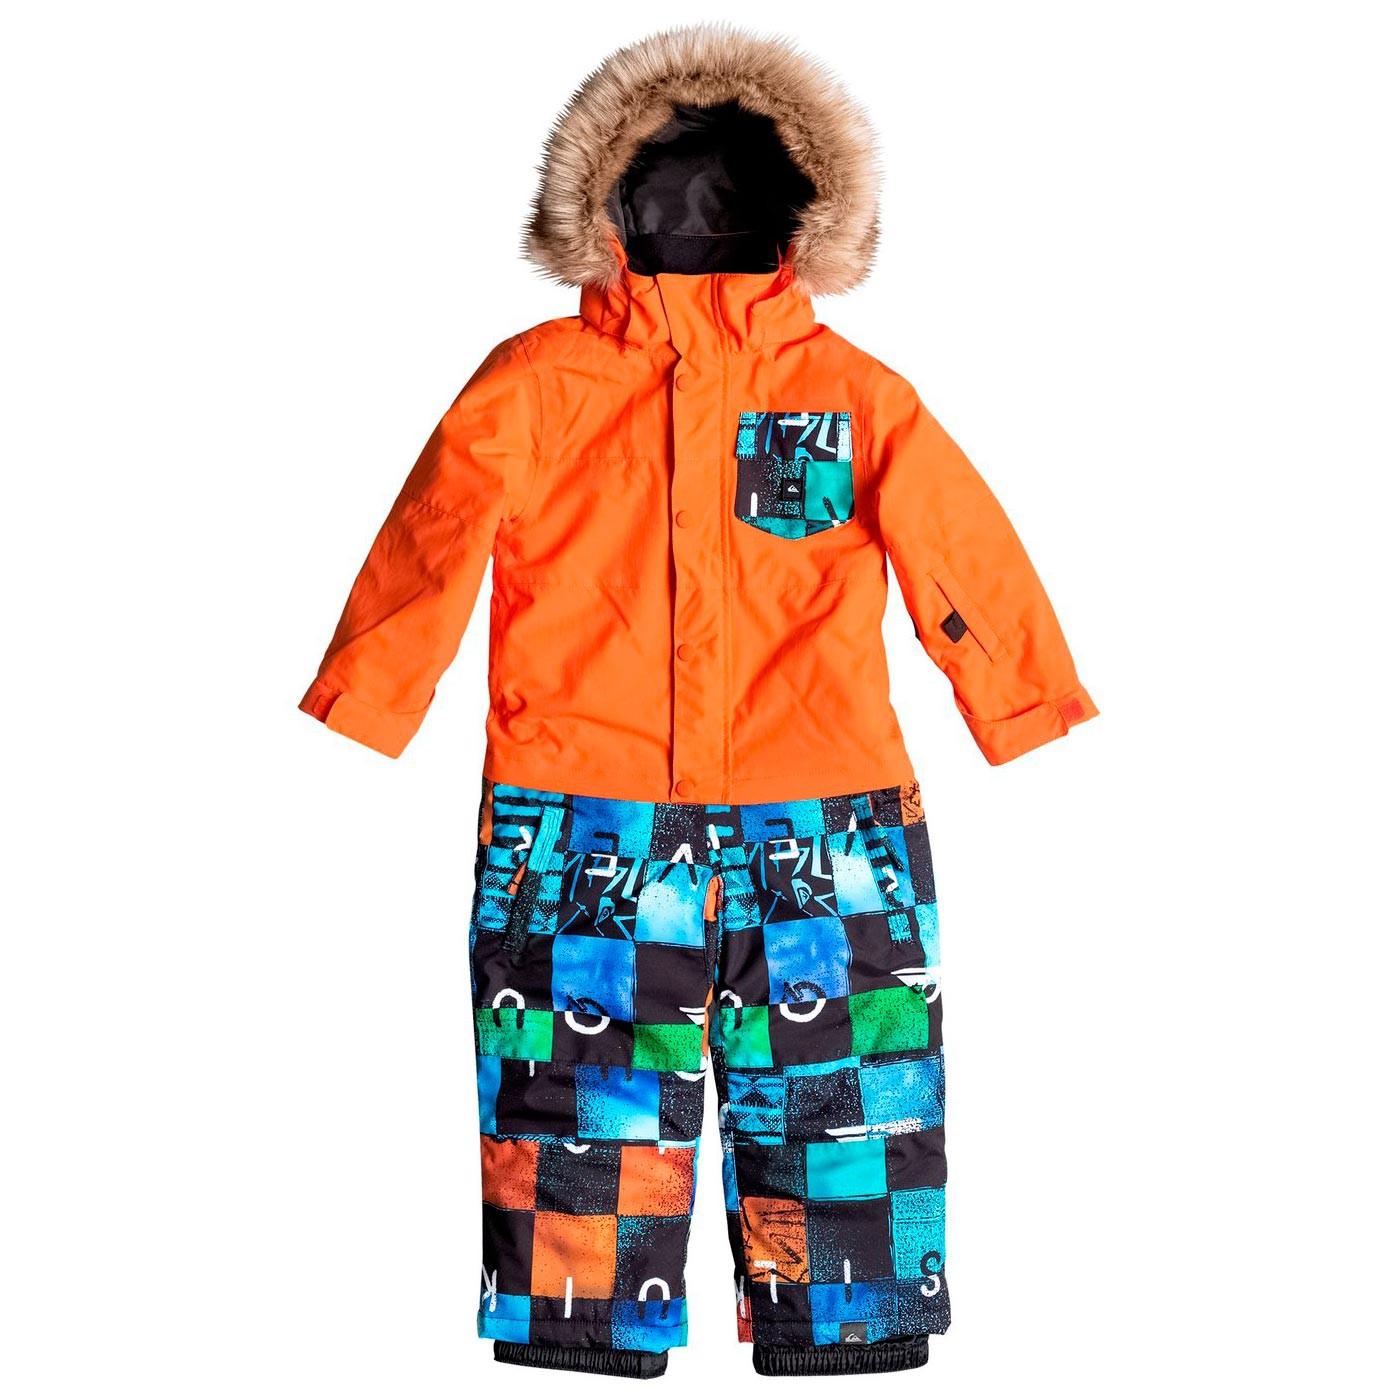 Bunda Quiksilver Rookie Kids Suit chakalapaki origin